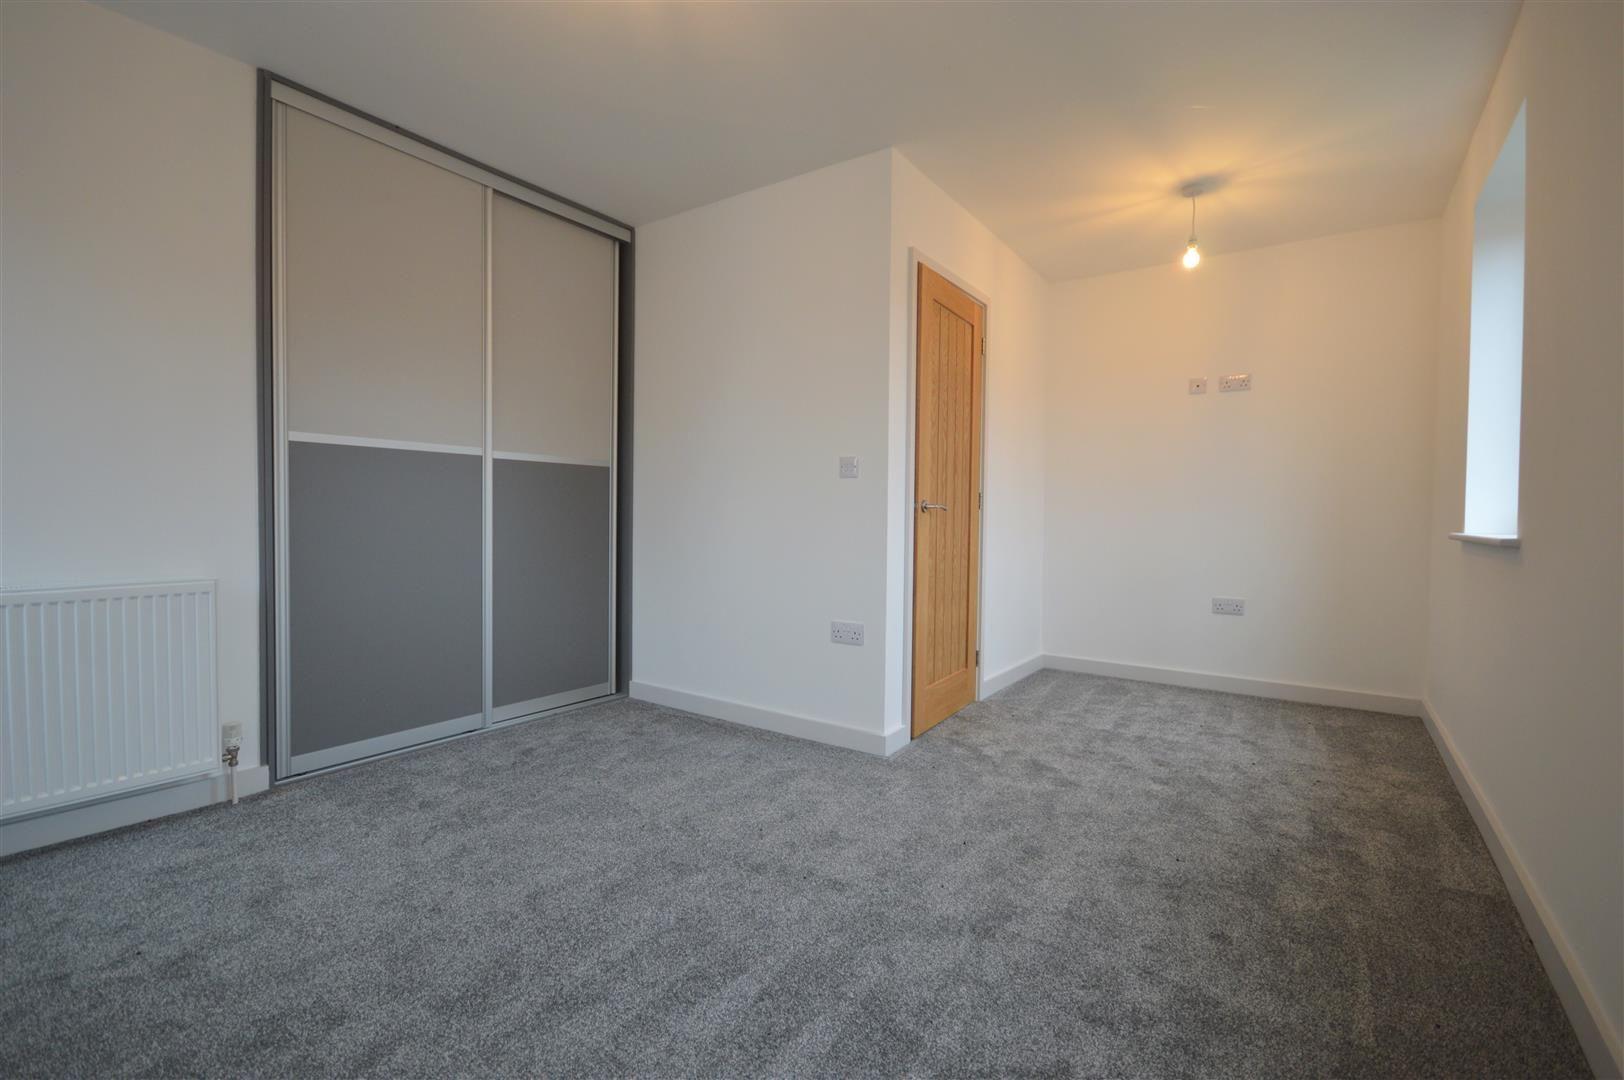 2 bed detached for sale in Leominster  - Property Image 7